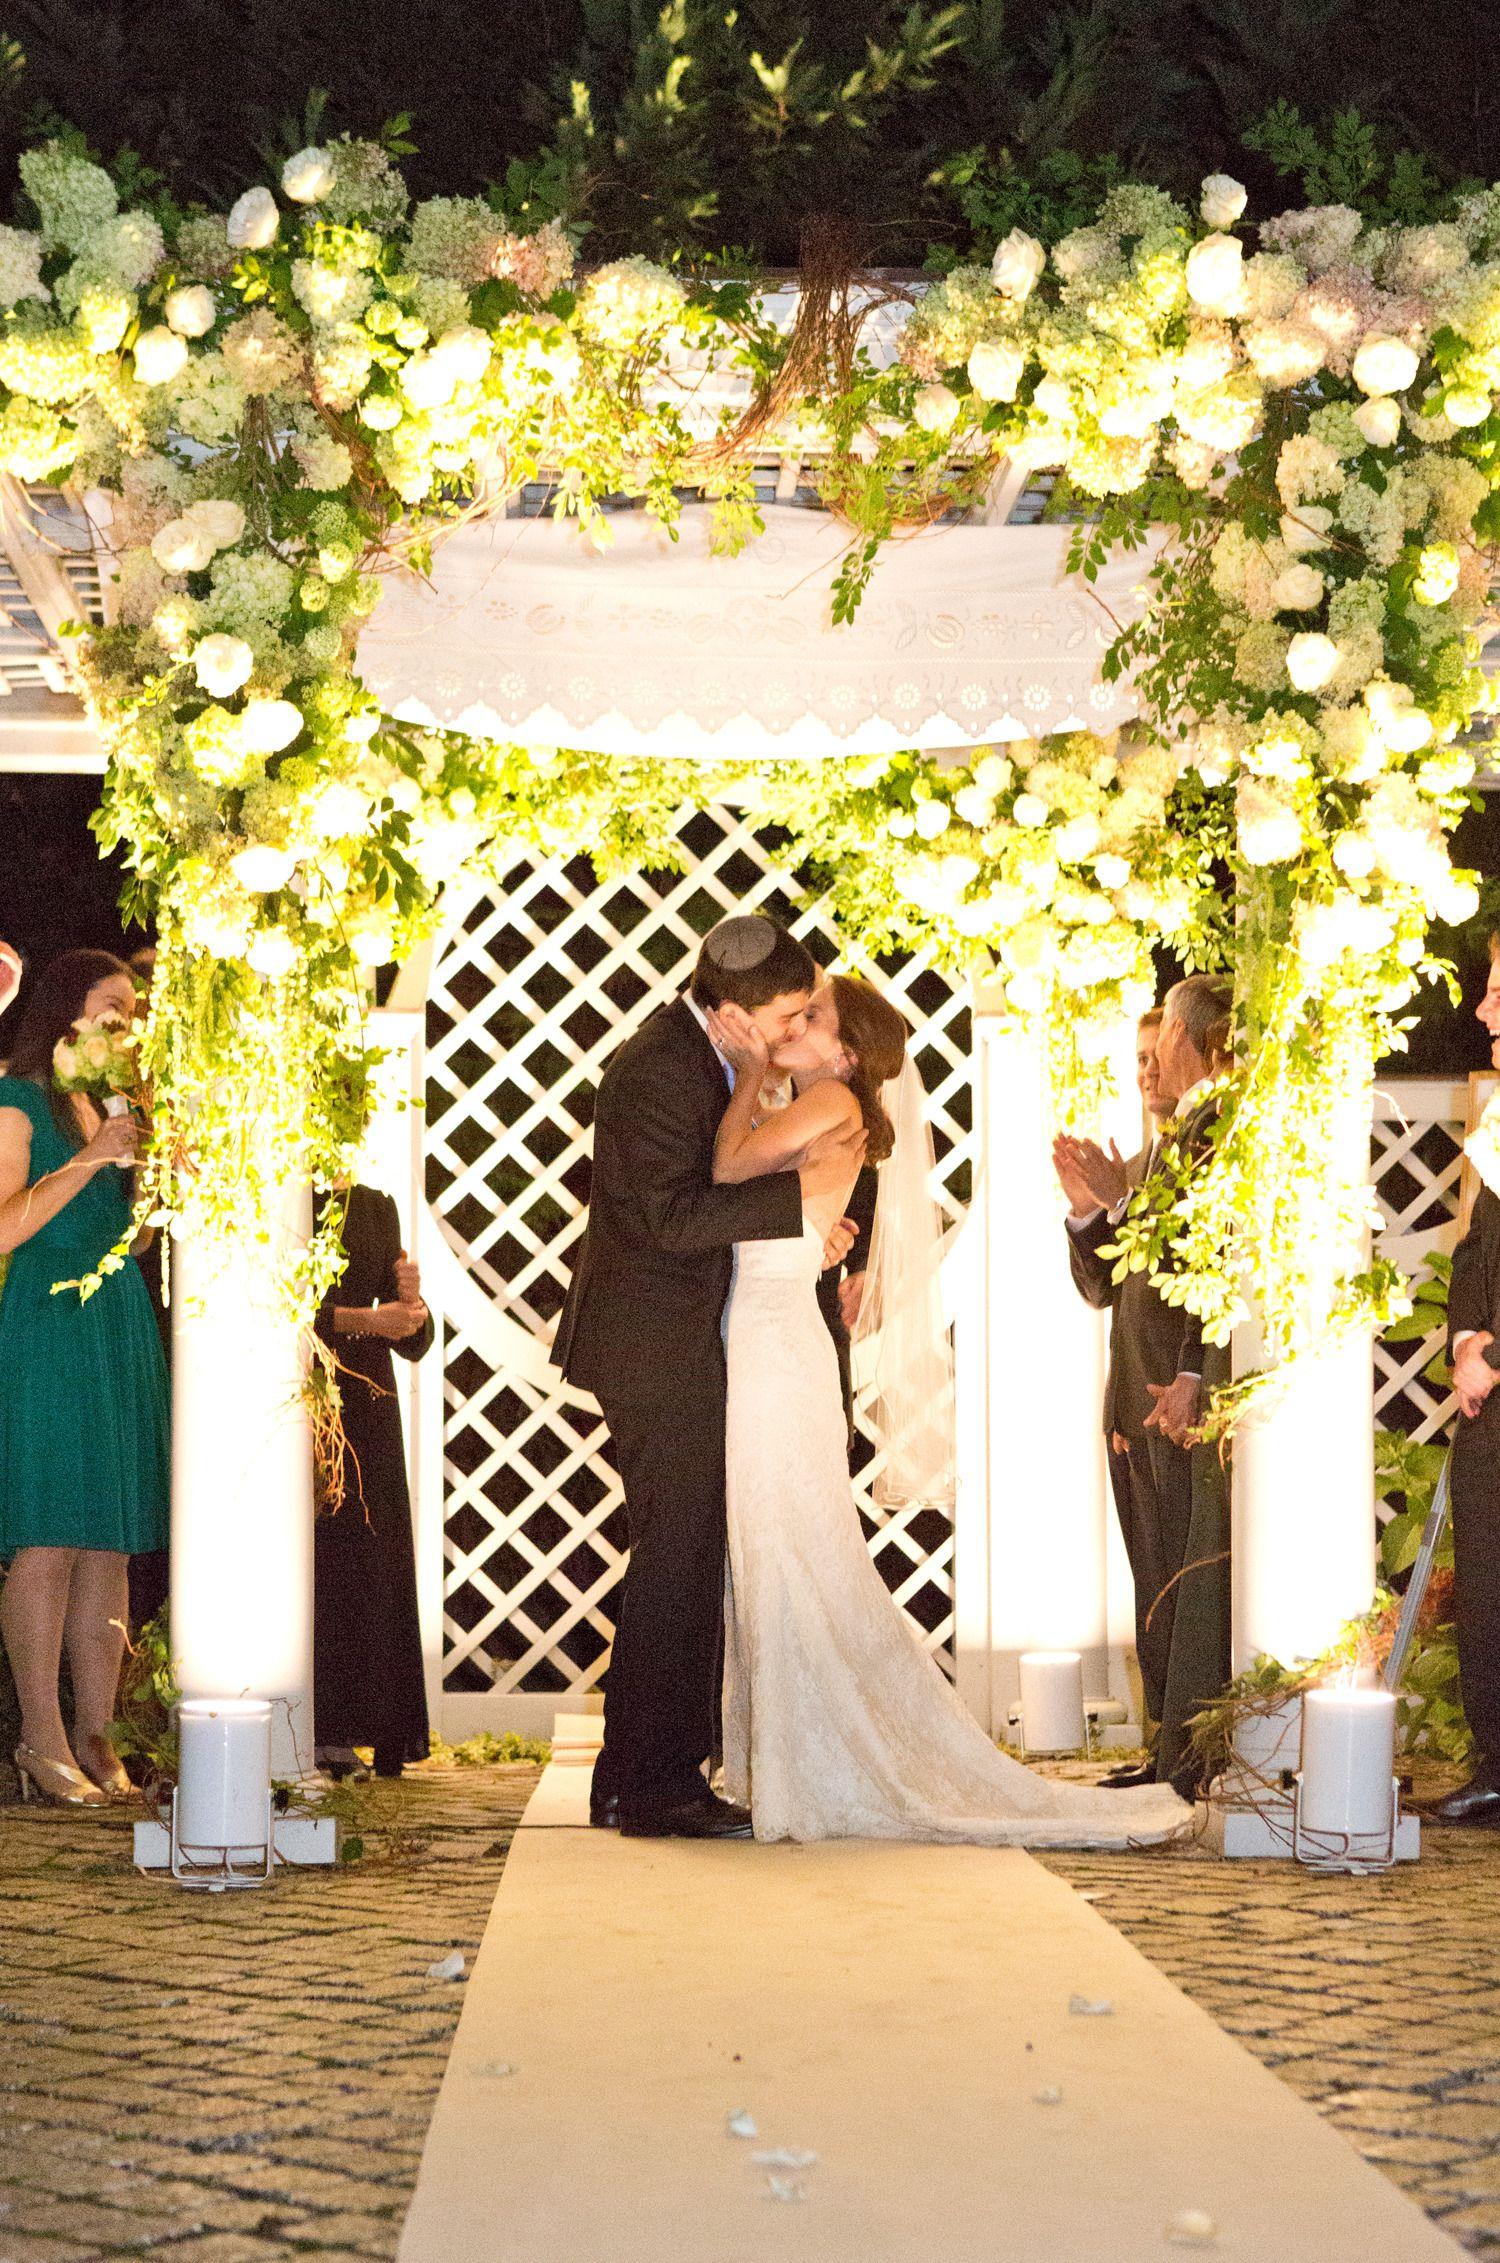 Photography: A Guy + A Girl Photography - aguyandagirlphotography.com/blog/  Read More: http://www.stylemepretty.com/2014/07/14/romantic-fall-wedding-3/